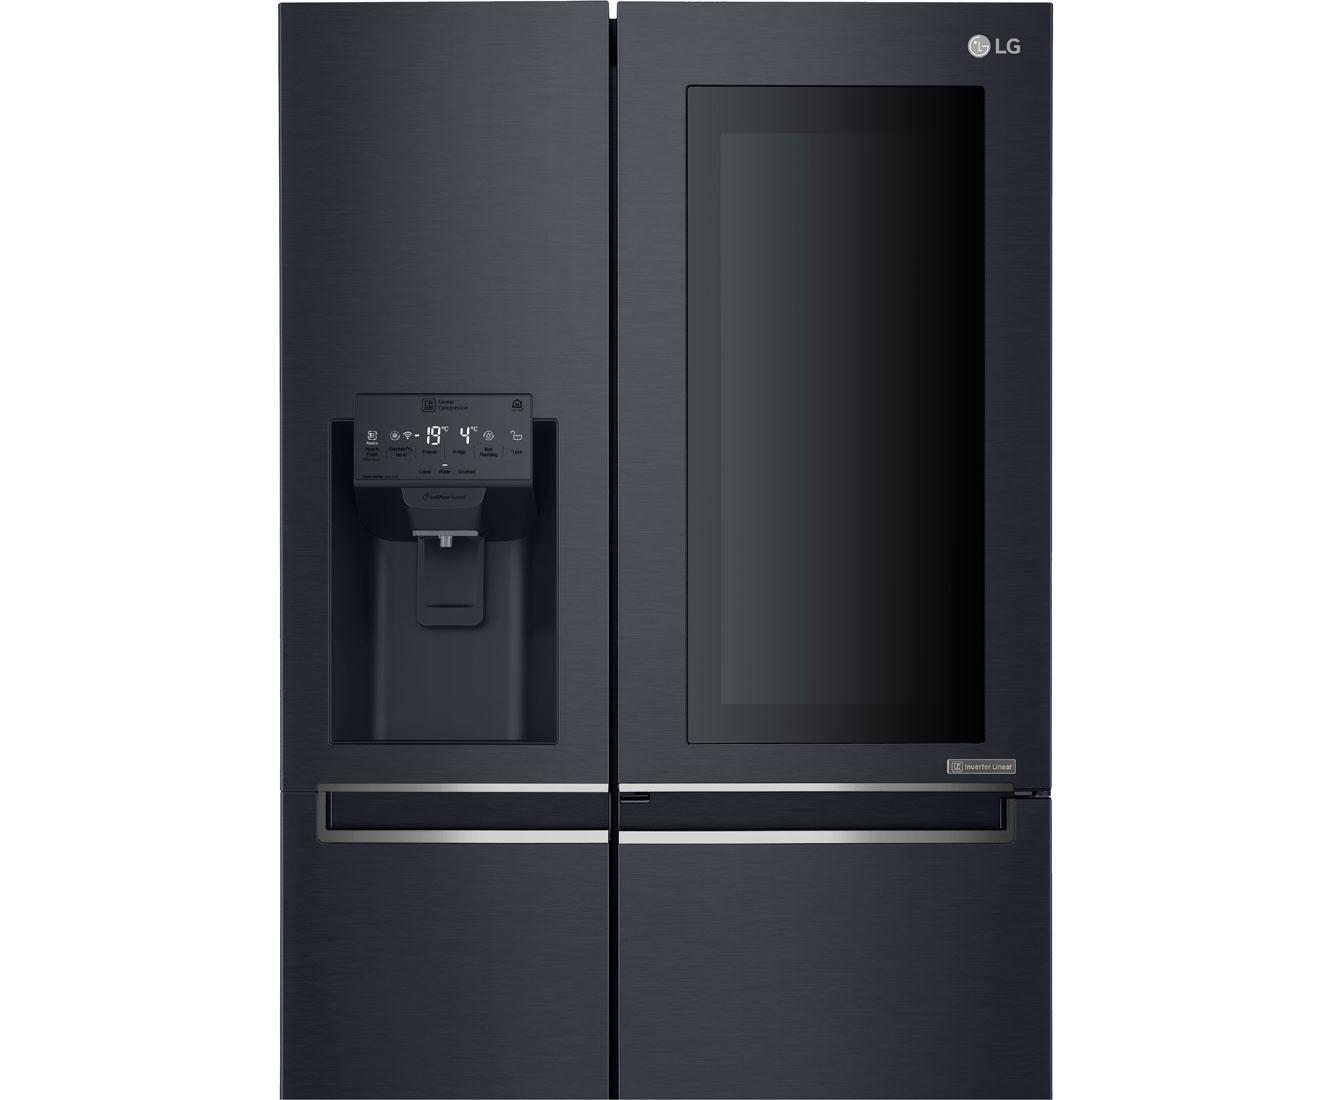 Side By Side Kühlschrank Anthrazit : Side by side kühlschrank schwarz matt: kühlschrank side by side lg